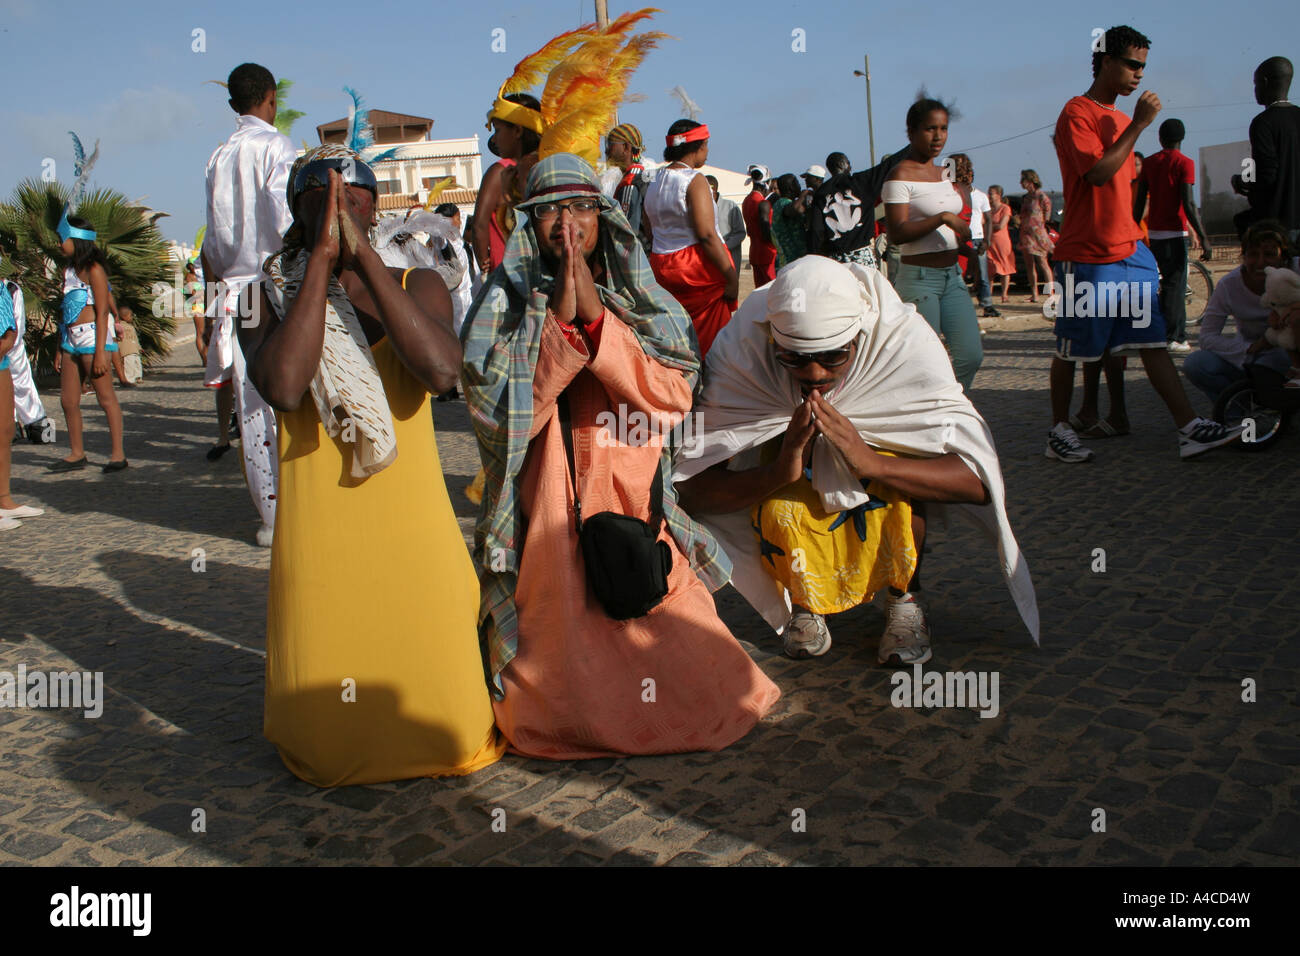 Mocking Islamic prayers during the carnival Sal Santa Maria - Stock Image